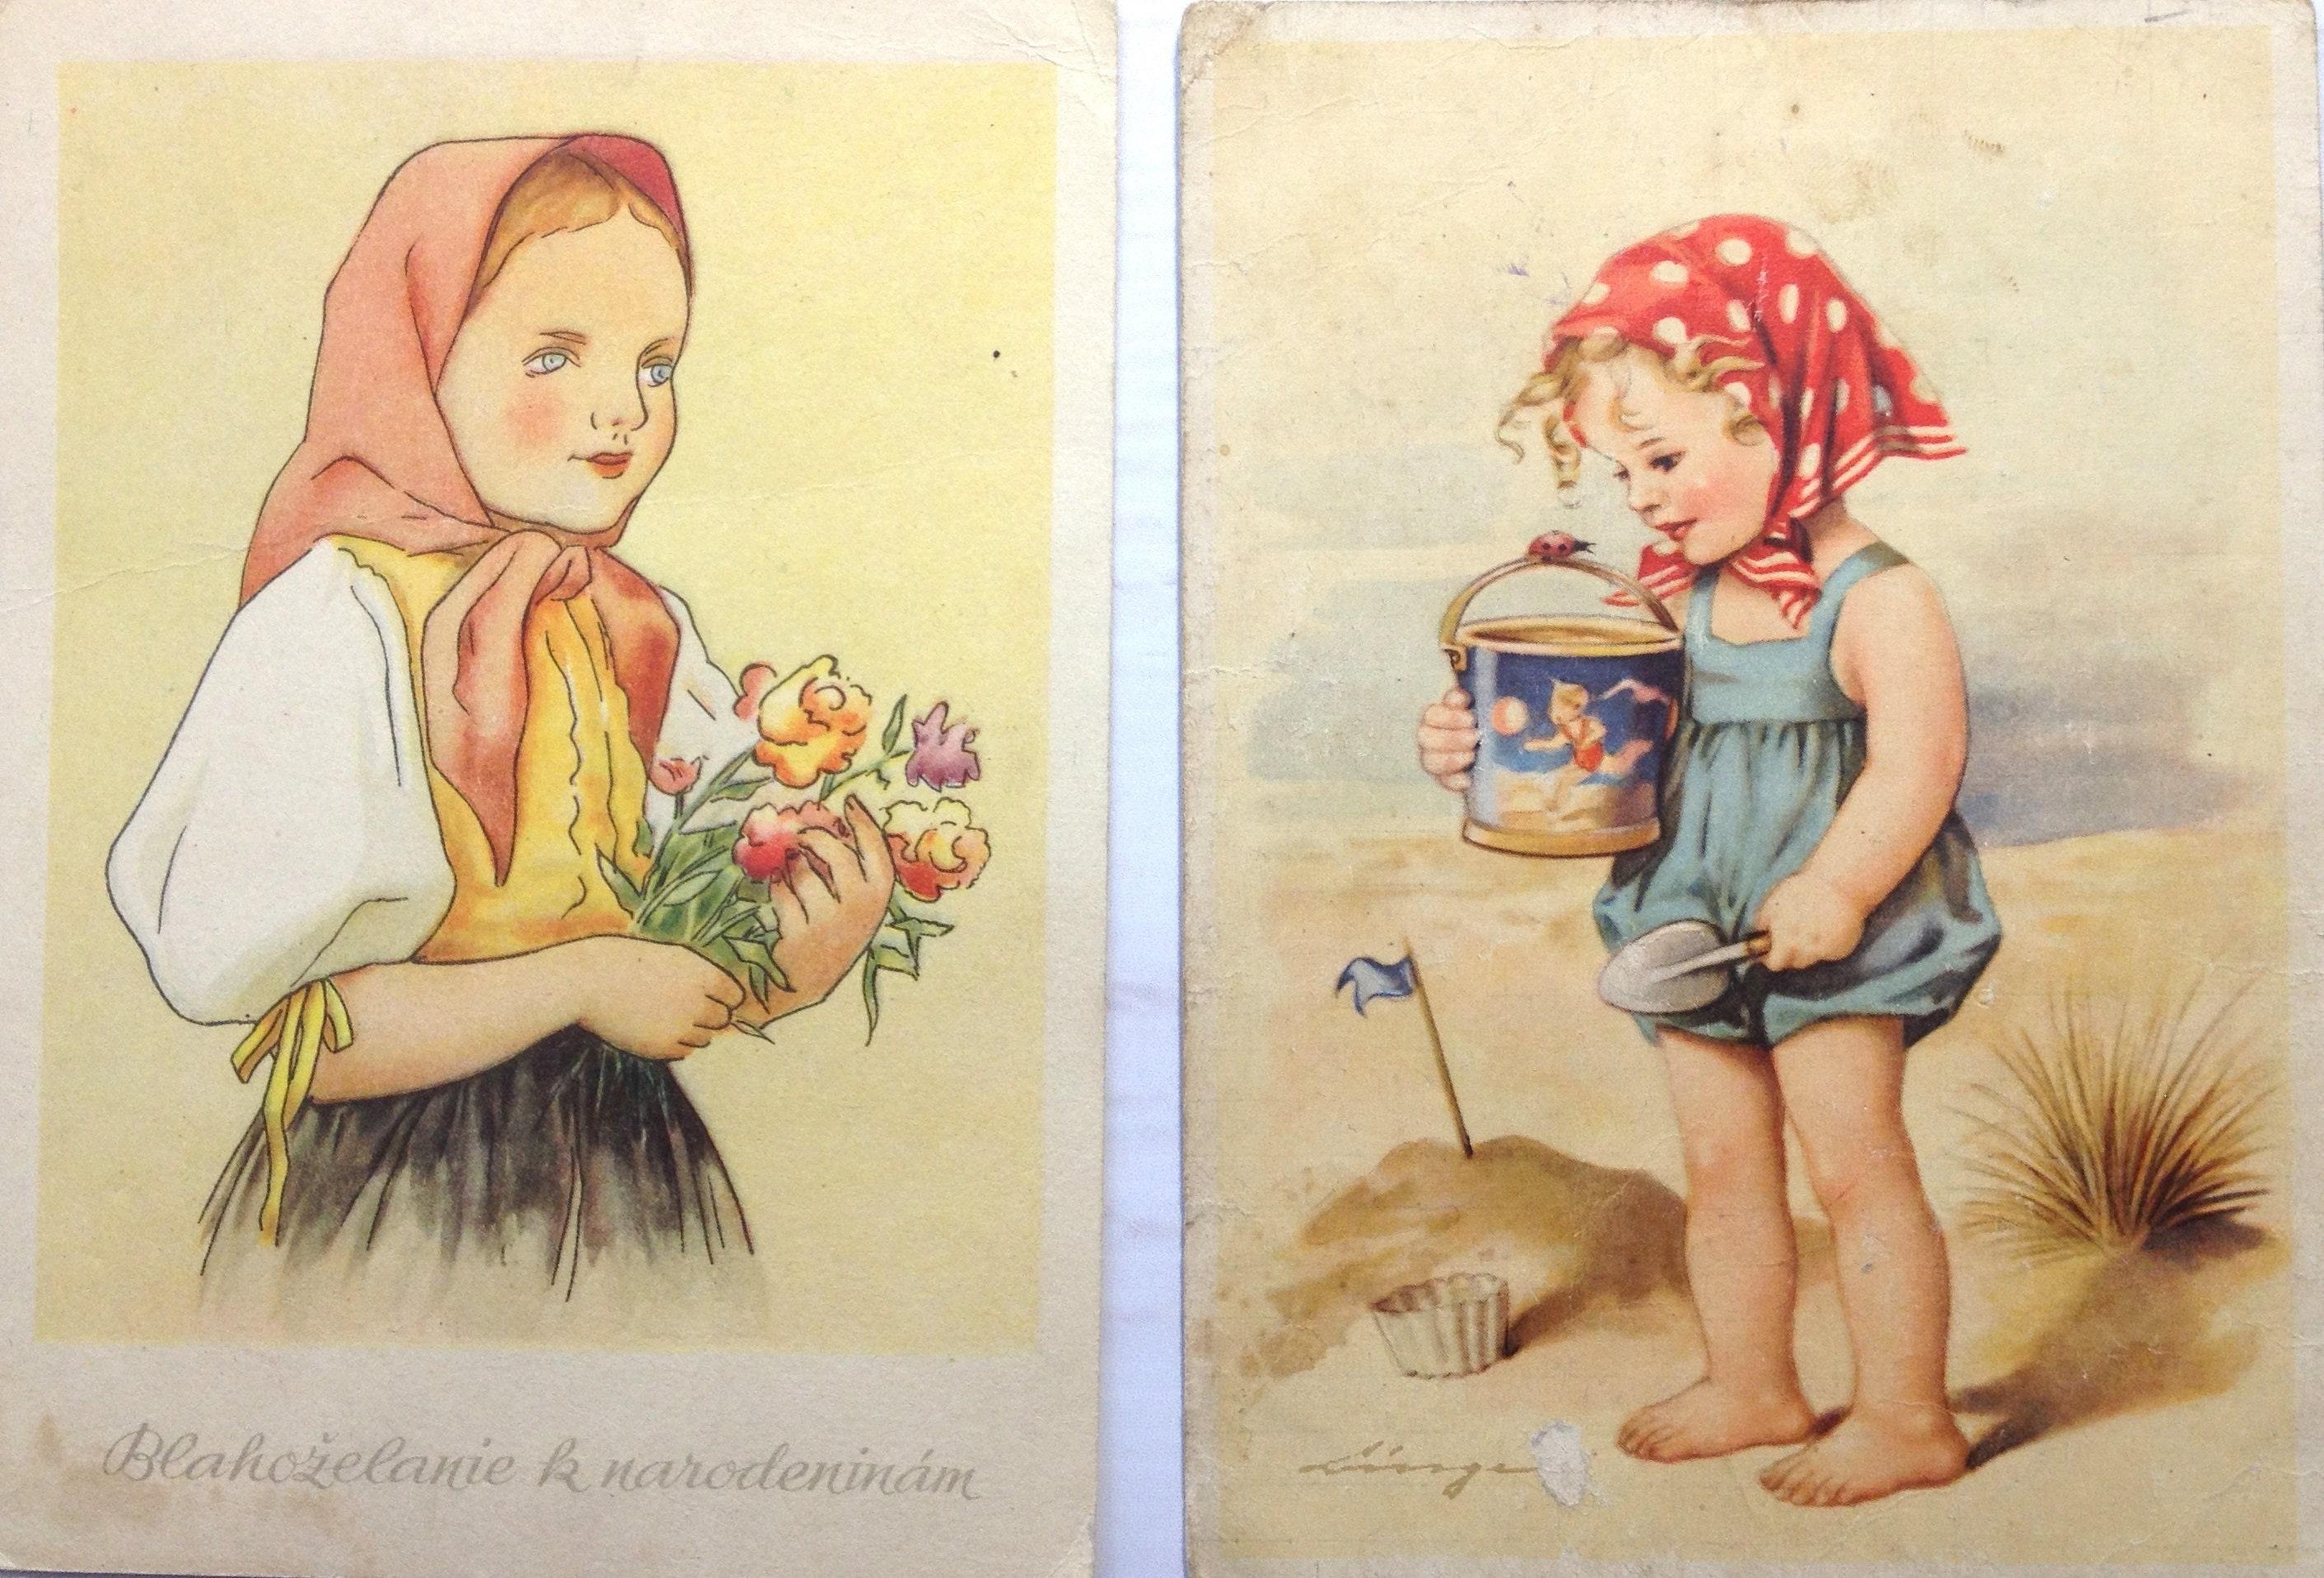 Postcards Lot 2 pcs children's Illustrations Children Pretty girls Vintage  Postcards Retro postcards Vintage postcard sets